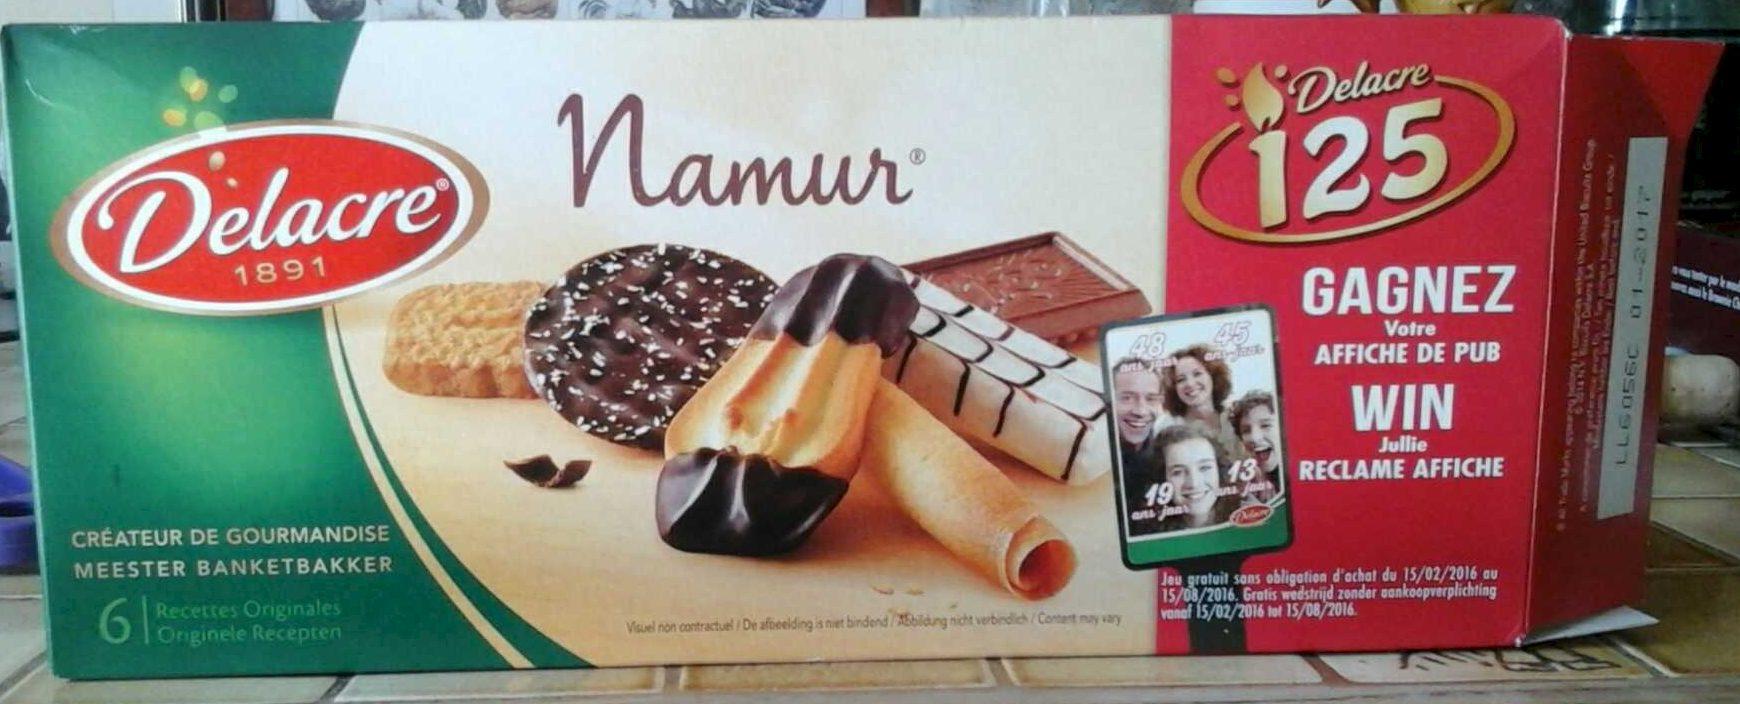 Namur - Produit - fr